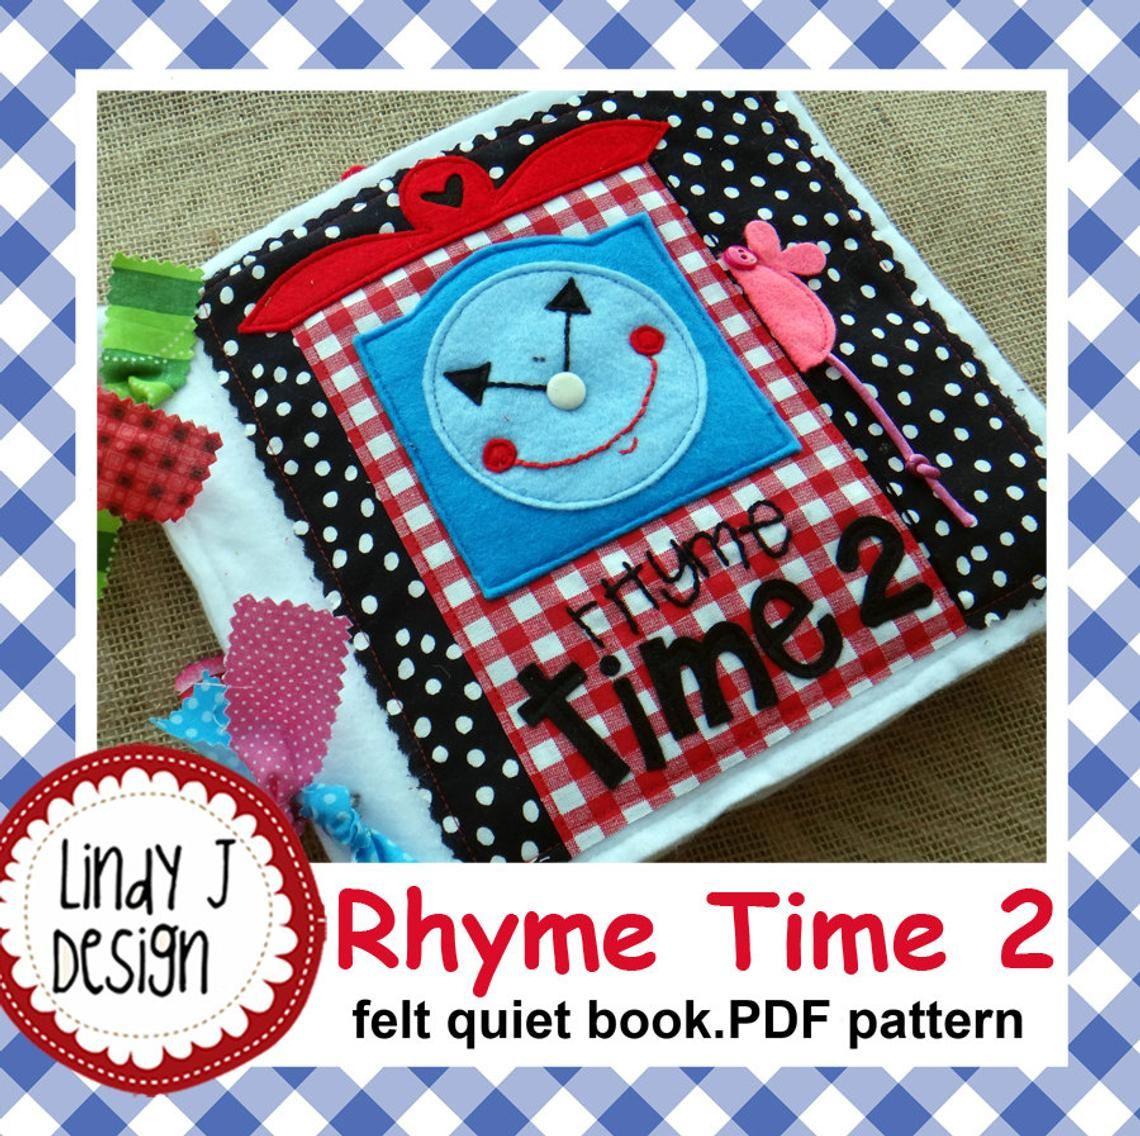 Rhyme Time 2 Felt Quiet Book Pattern